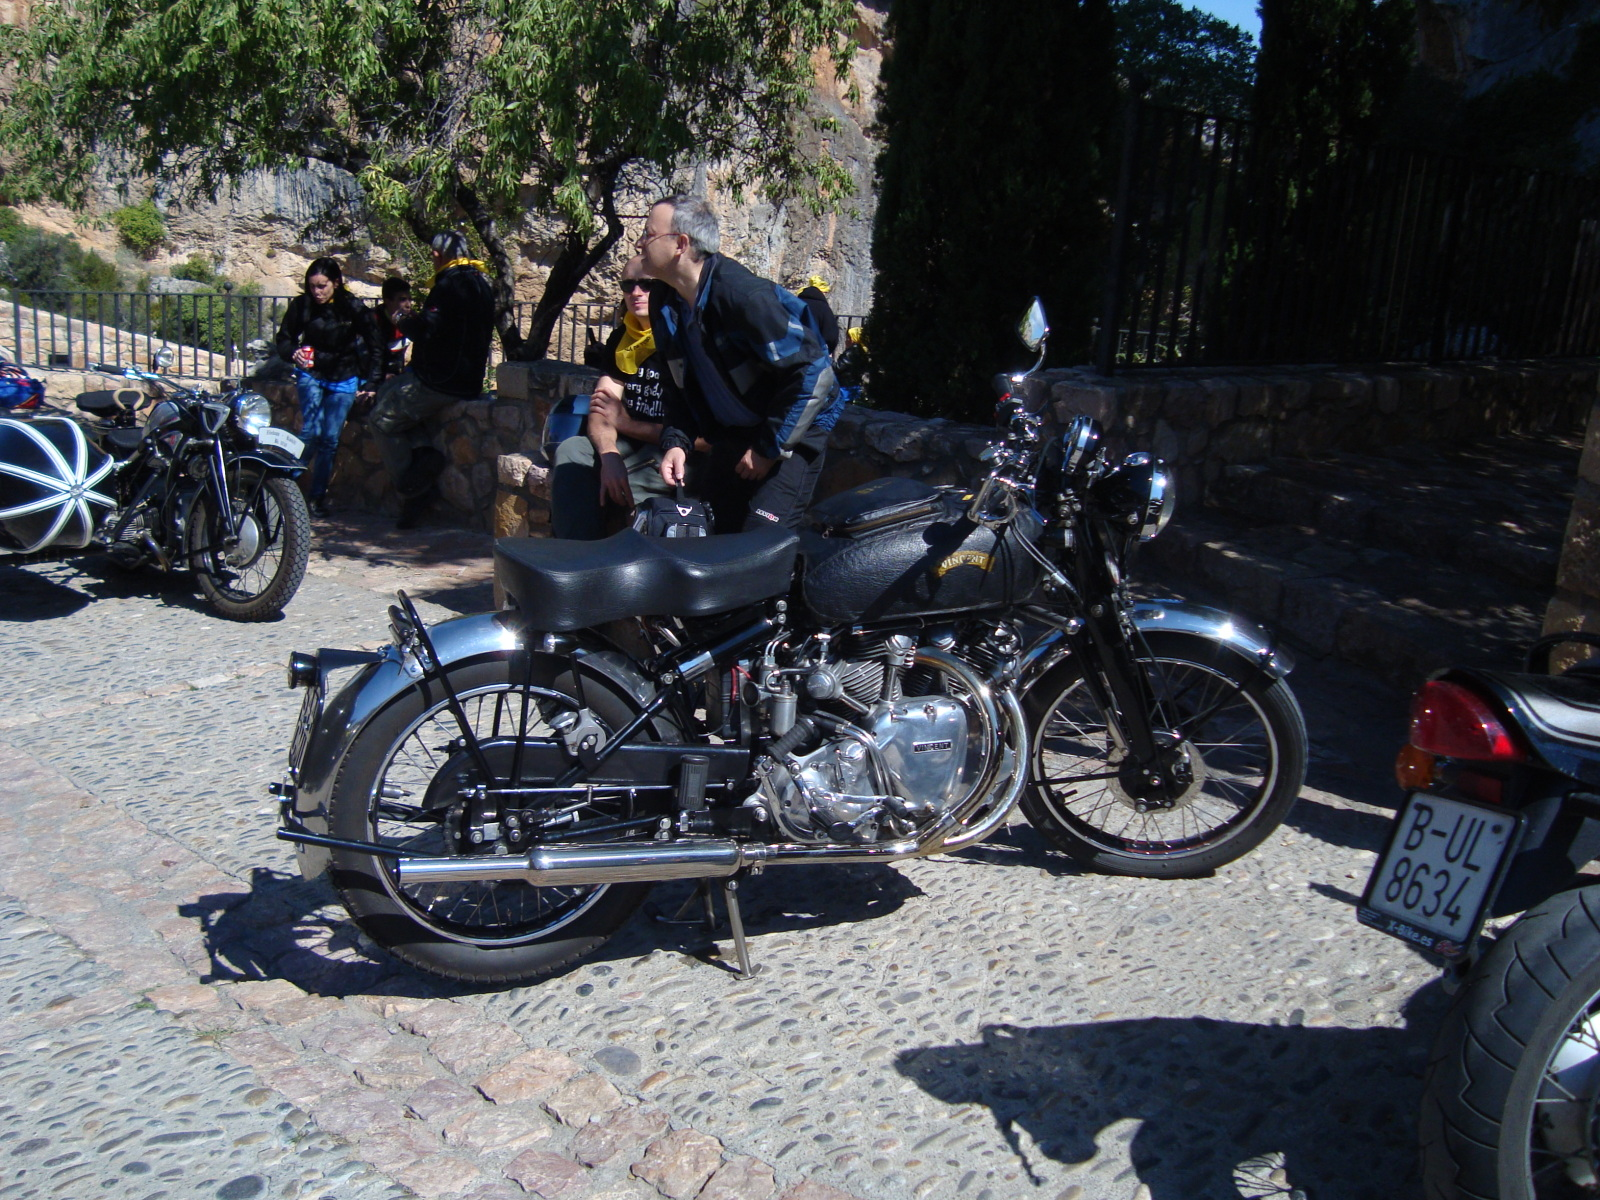 XI concentracion de motos antiguas en Alberuela de tubo (Huesca) 2dh781w